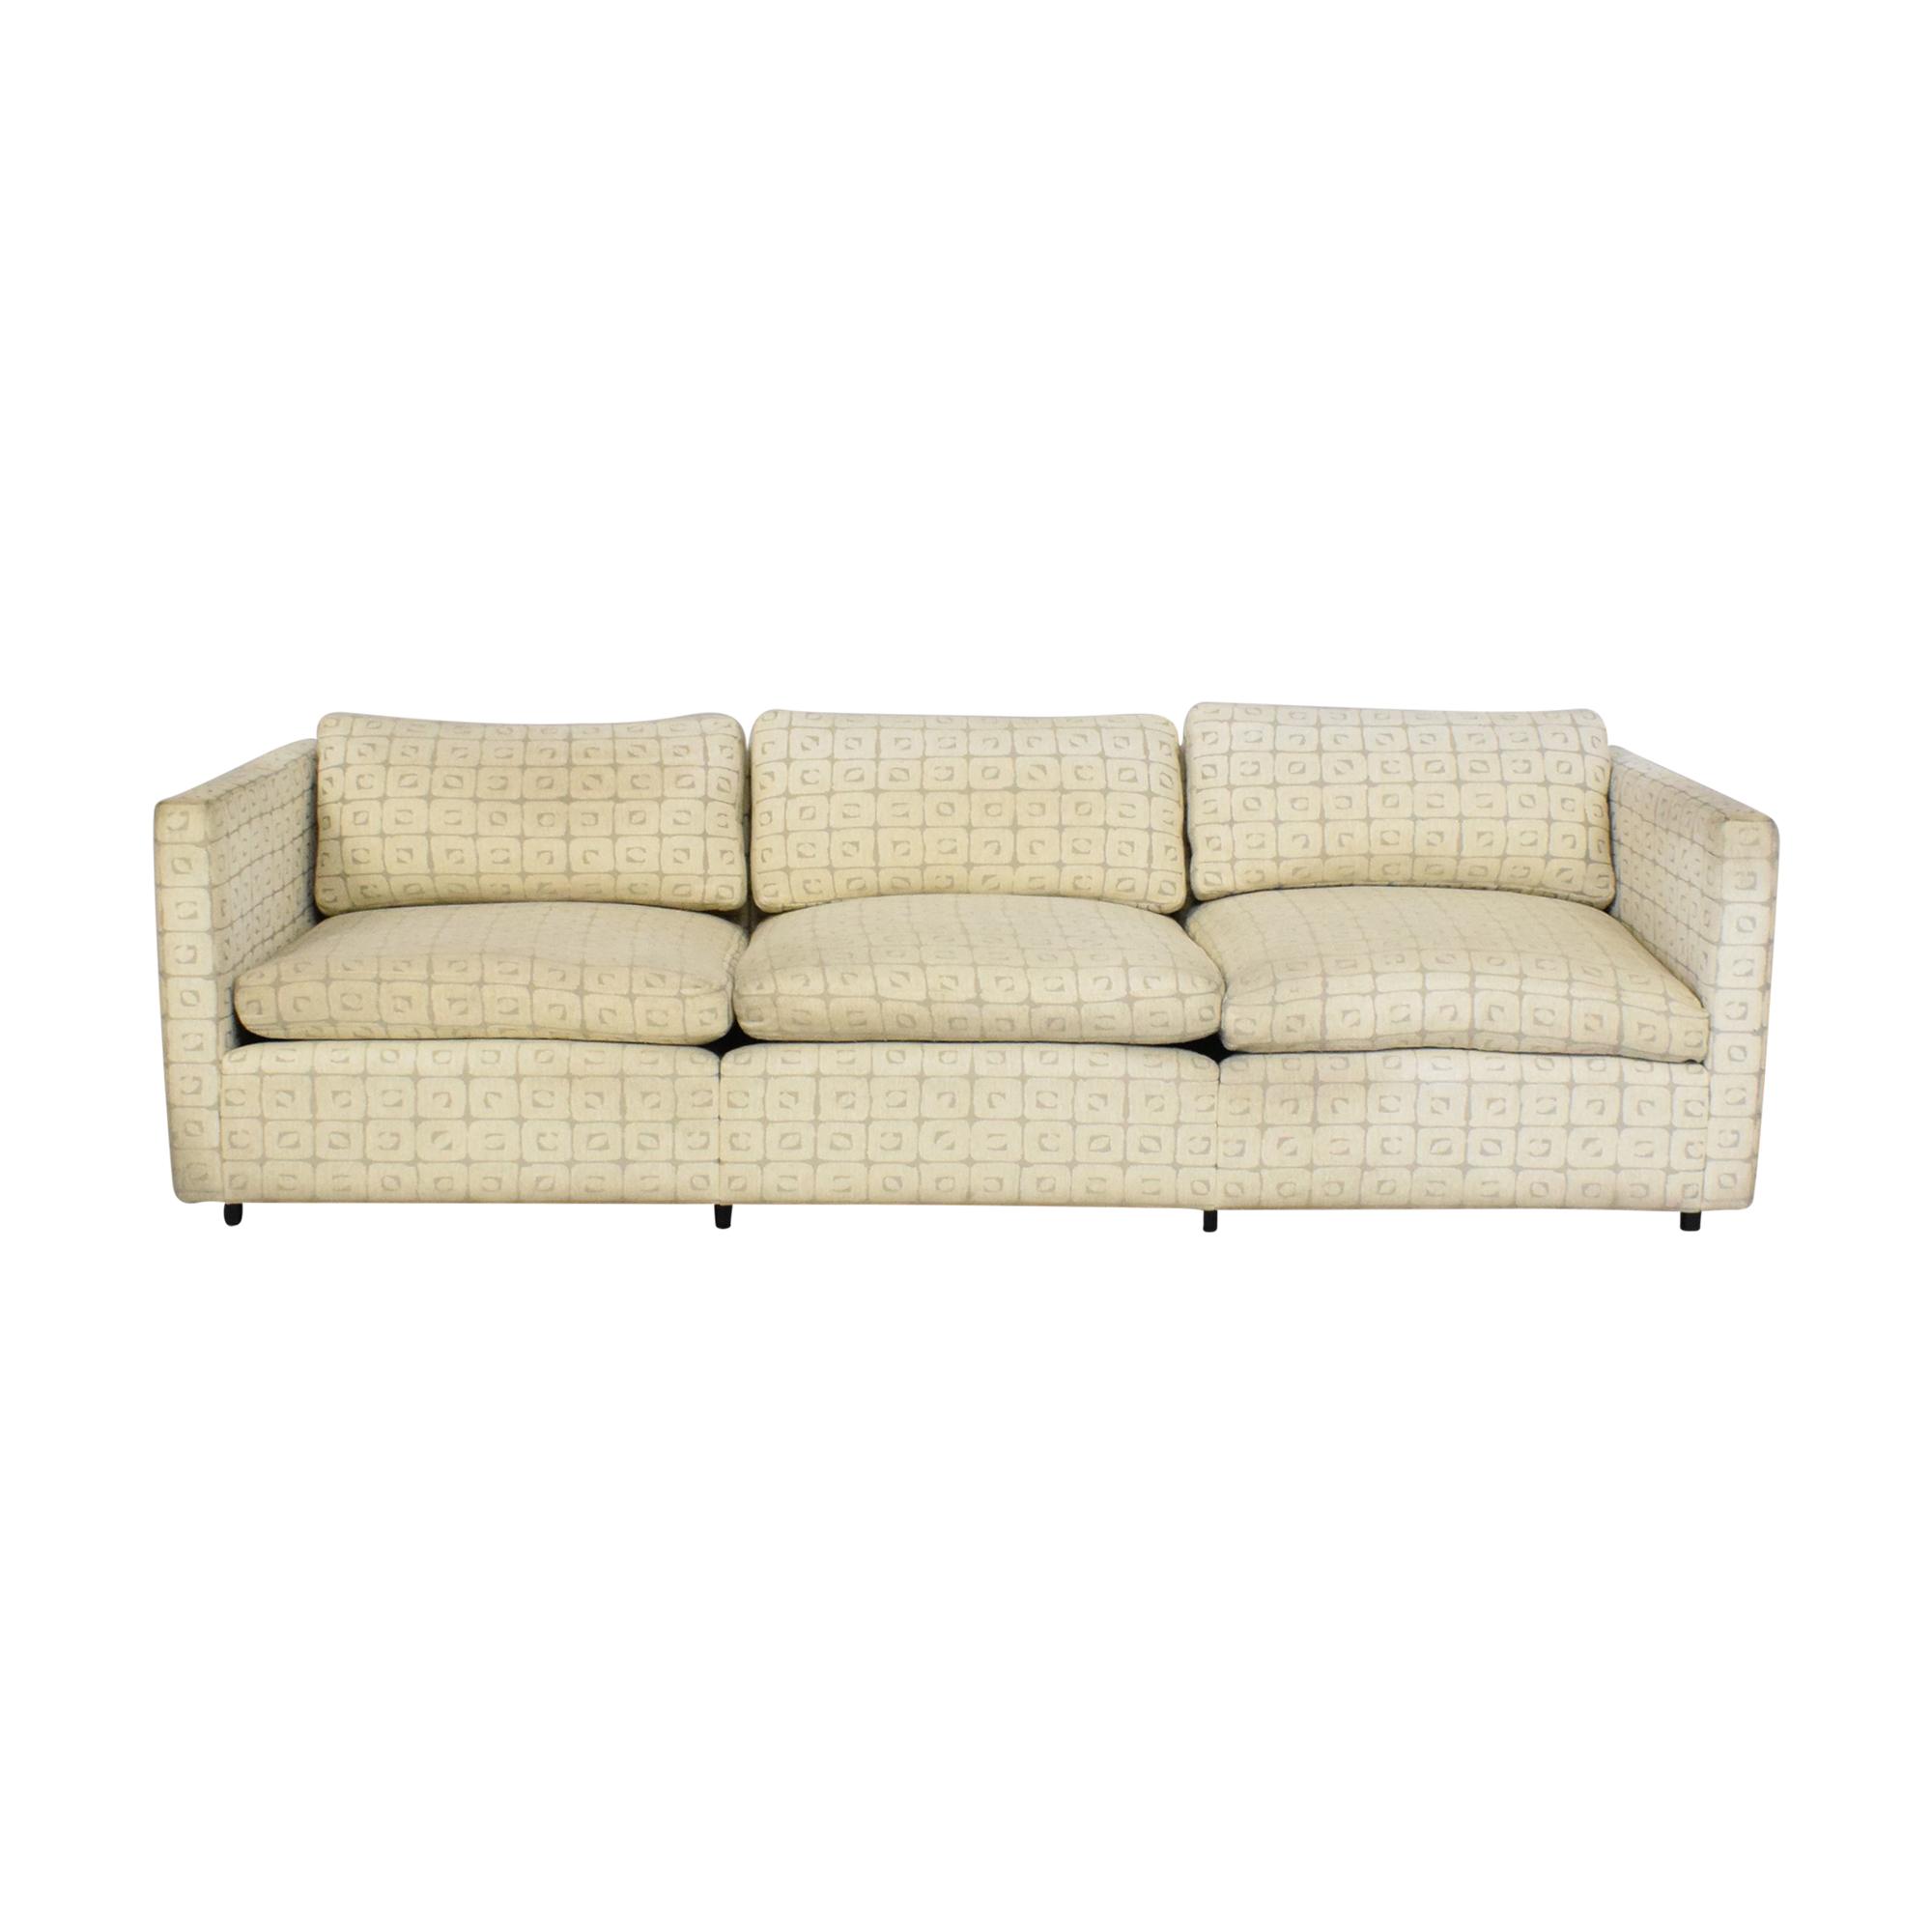 Knoll Knoll Pfister Sofa ma